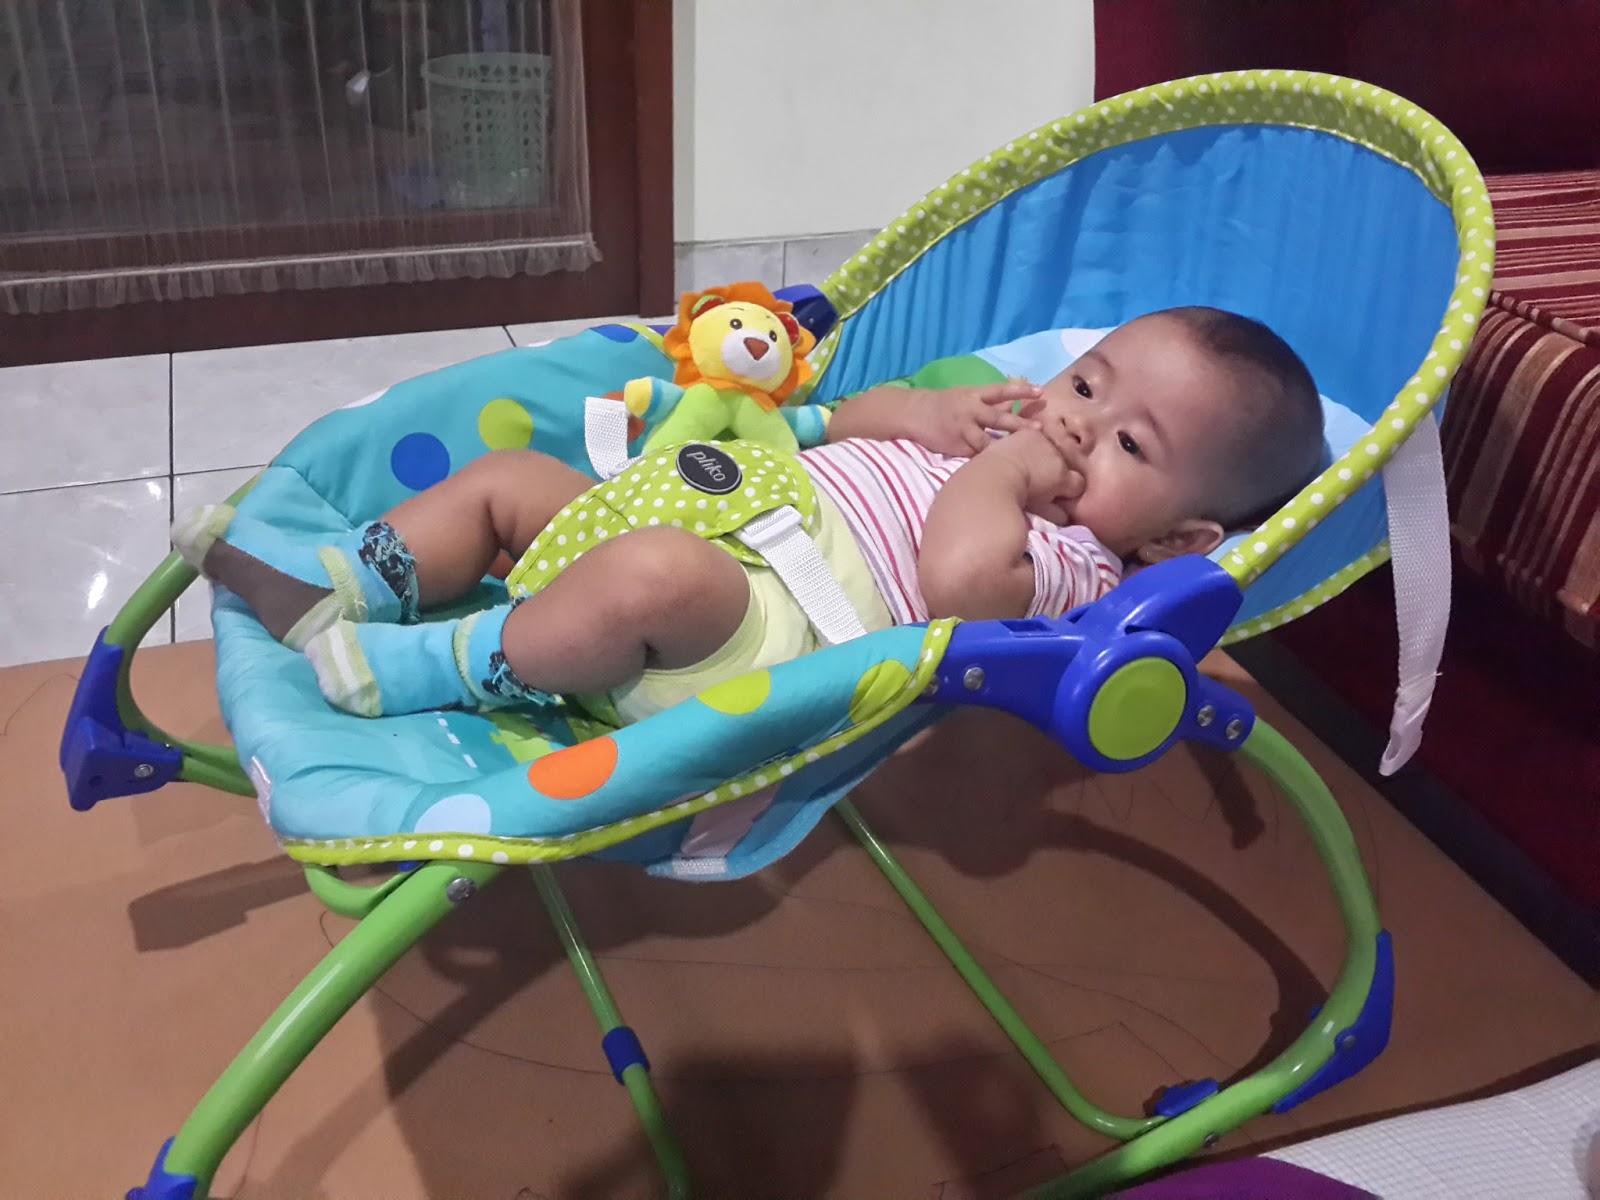 Baby Bouncer Pliko Hammock Tempat Duduk Bayi Favoritnya